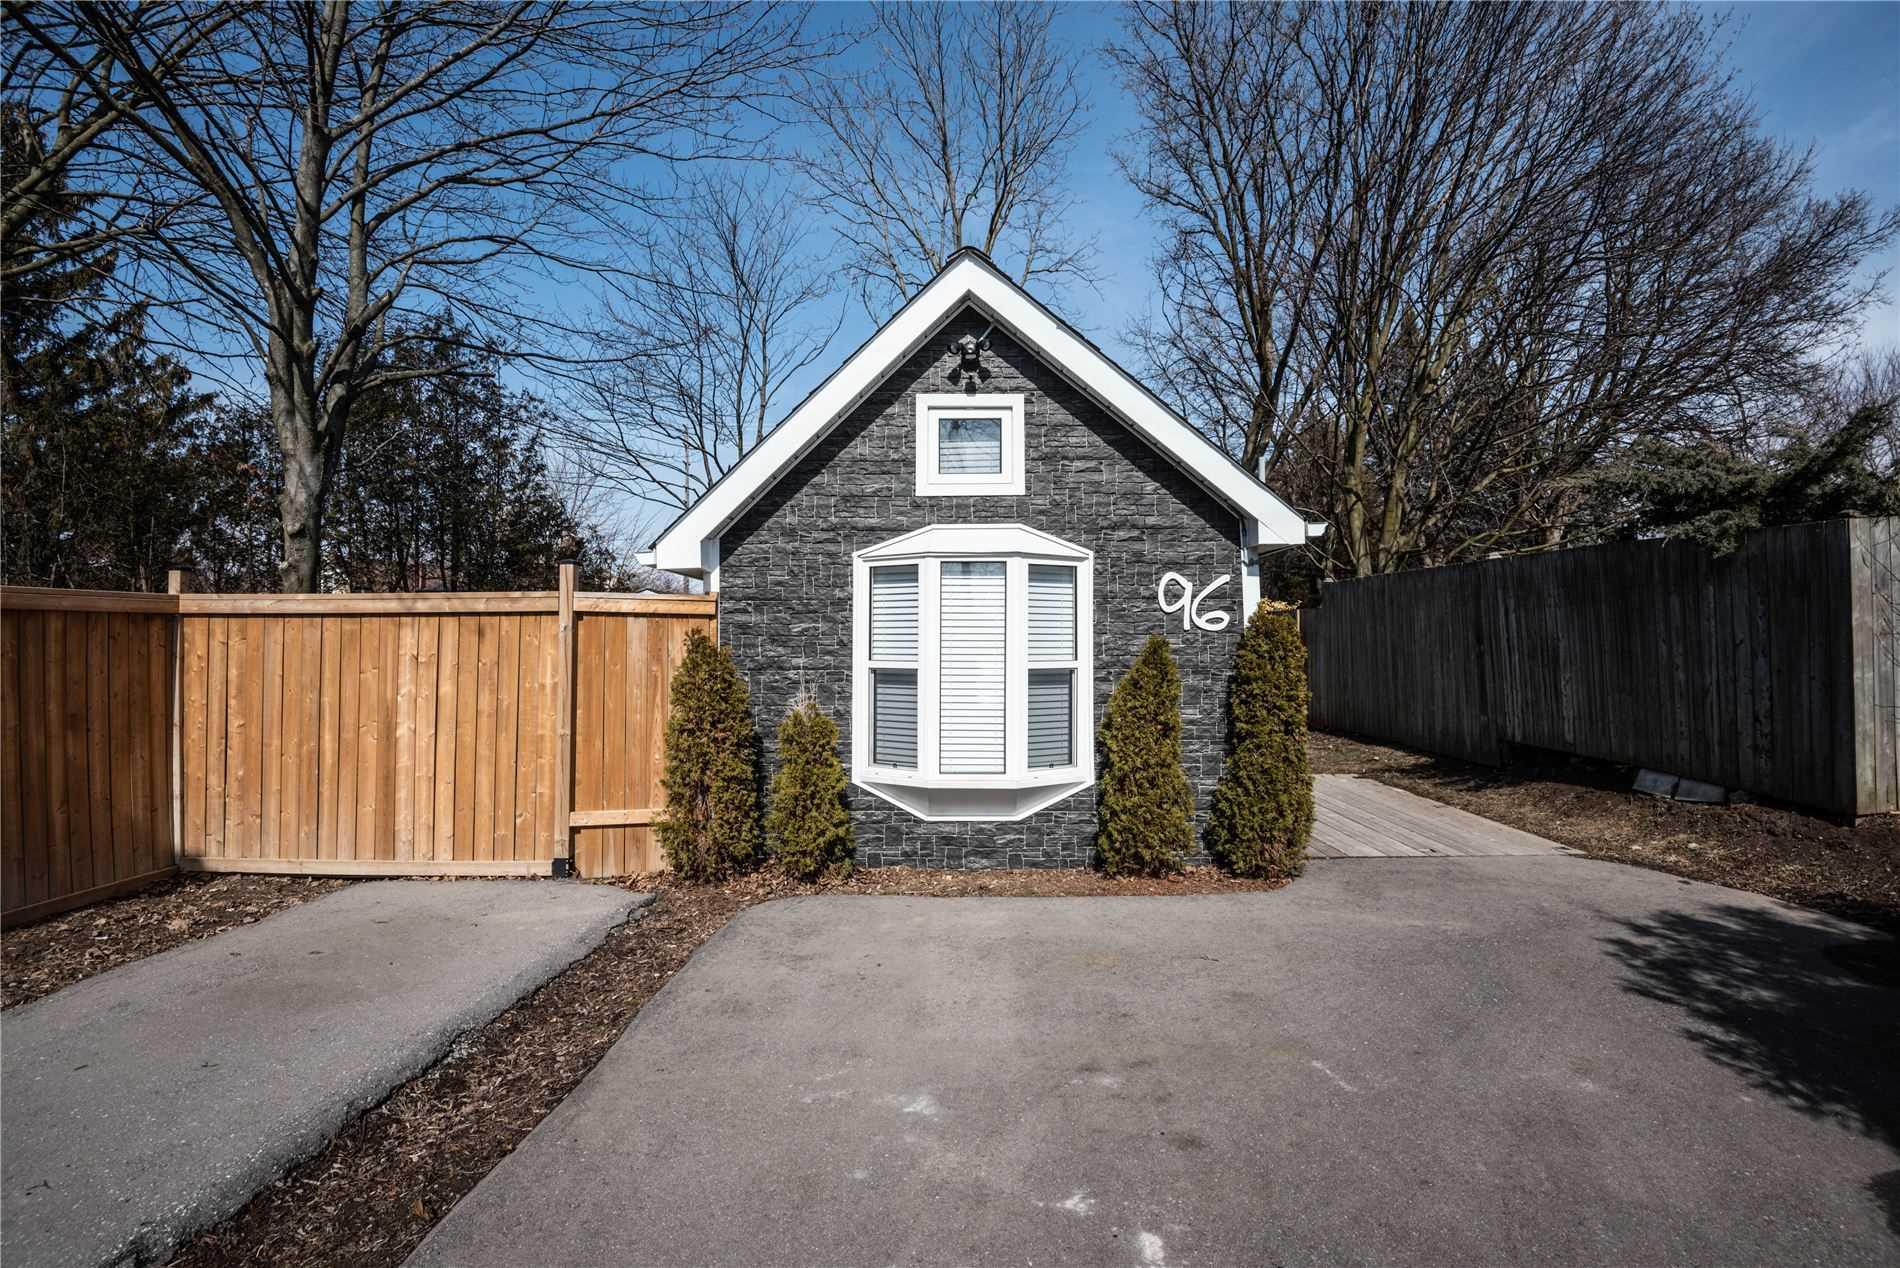 96 Quebec St, Oshawa, Ontario L1H2K5, ,1 BathroomBathrooms,Detached,For Sale,Quebec,E5145634